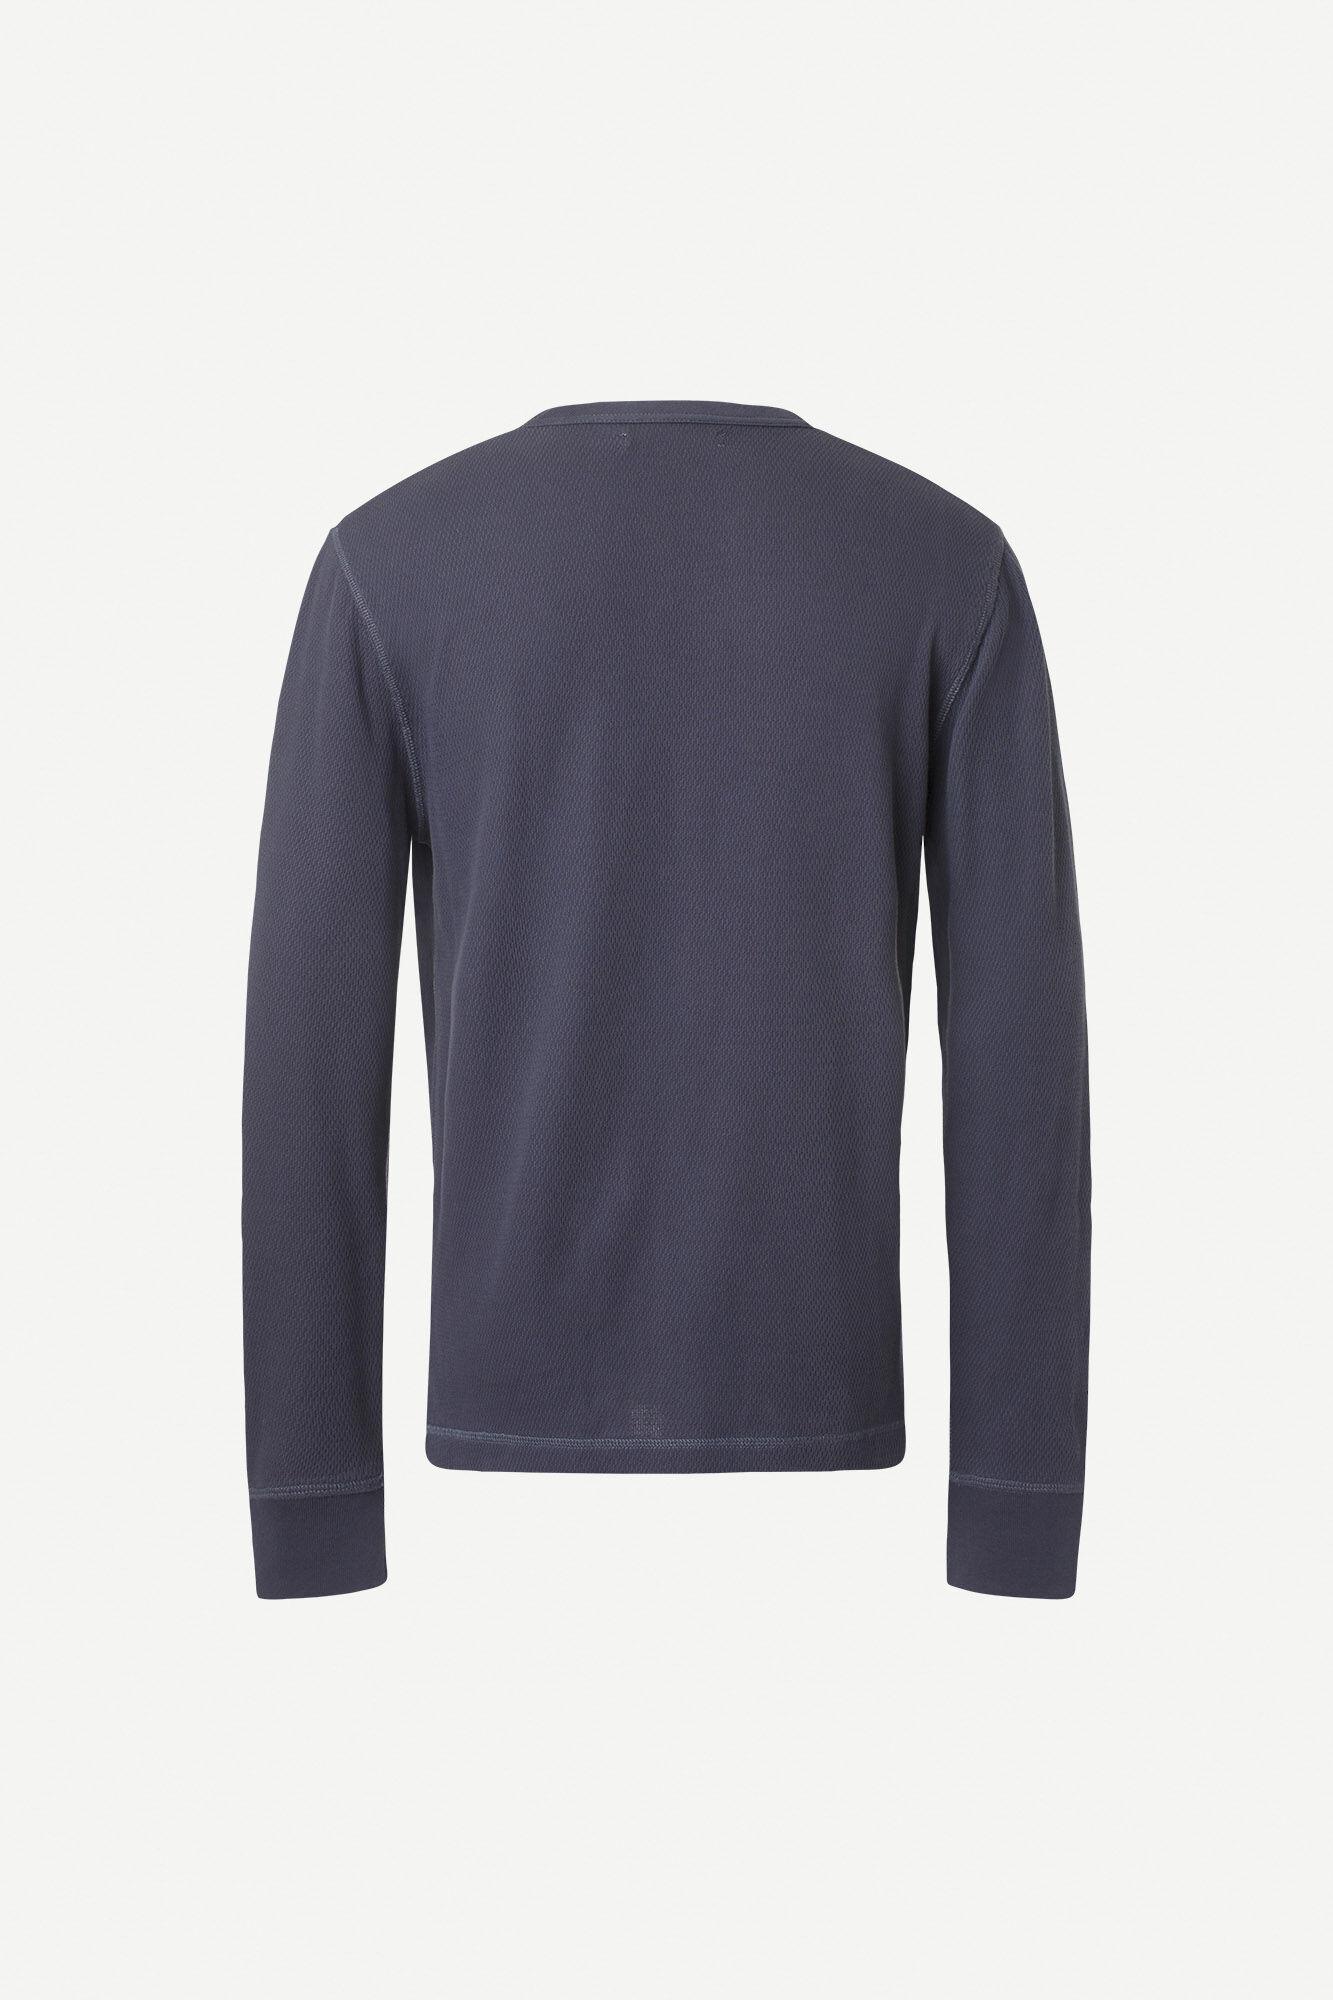 Parmo x t-shirt ls 11409